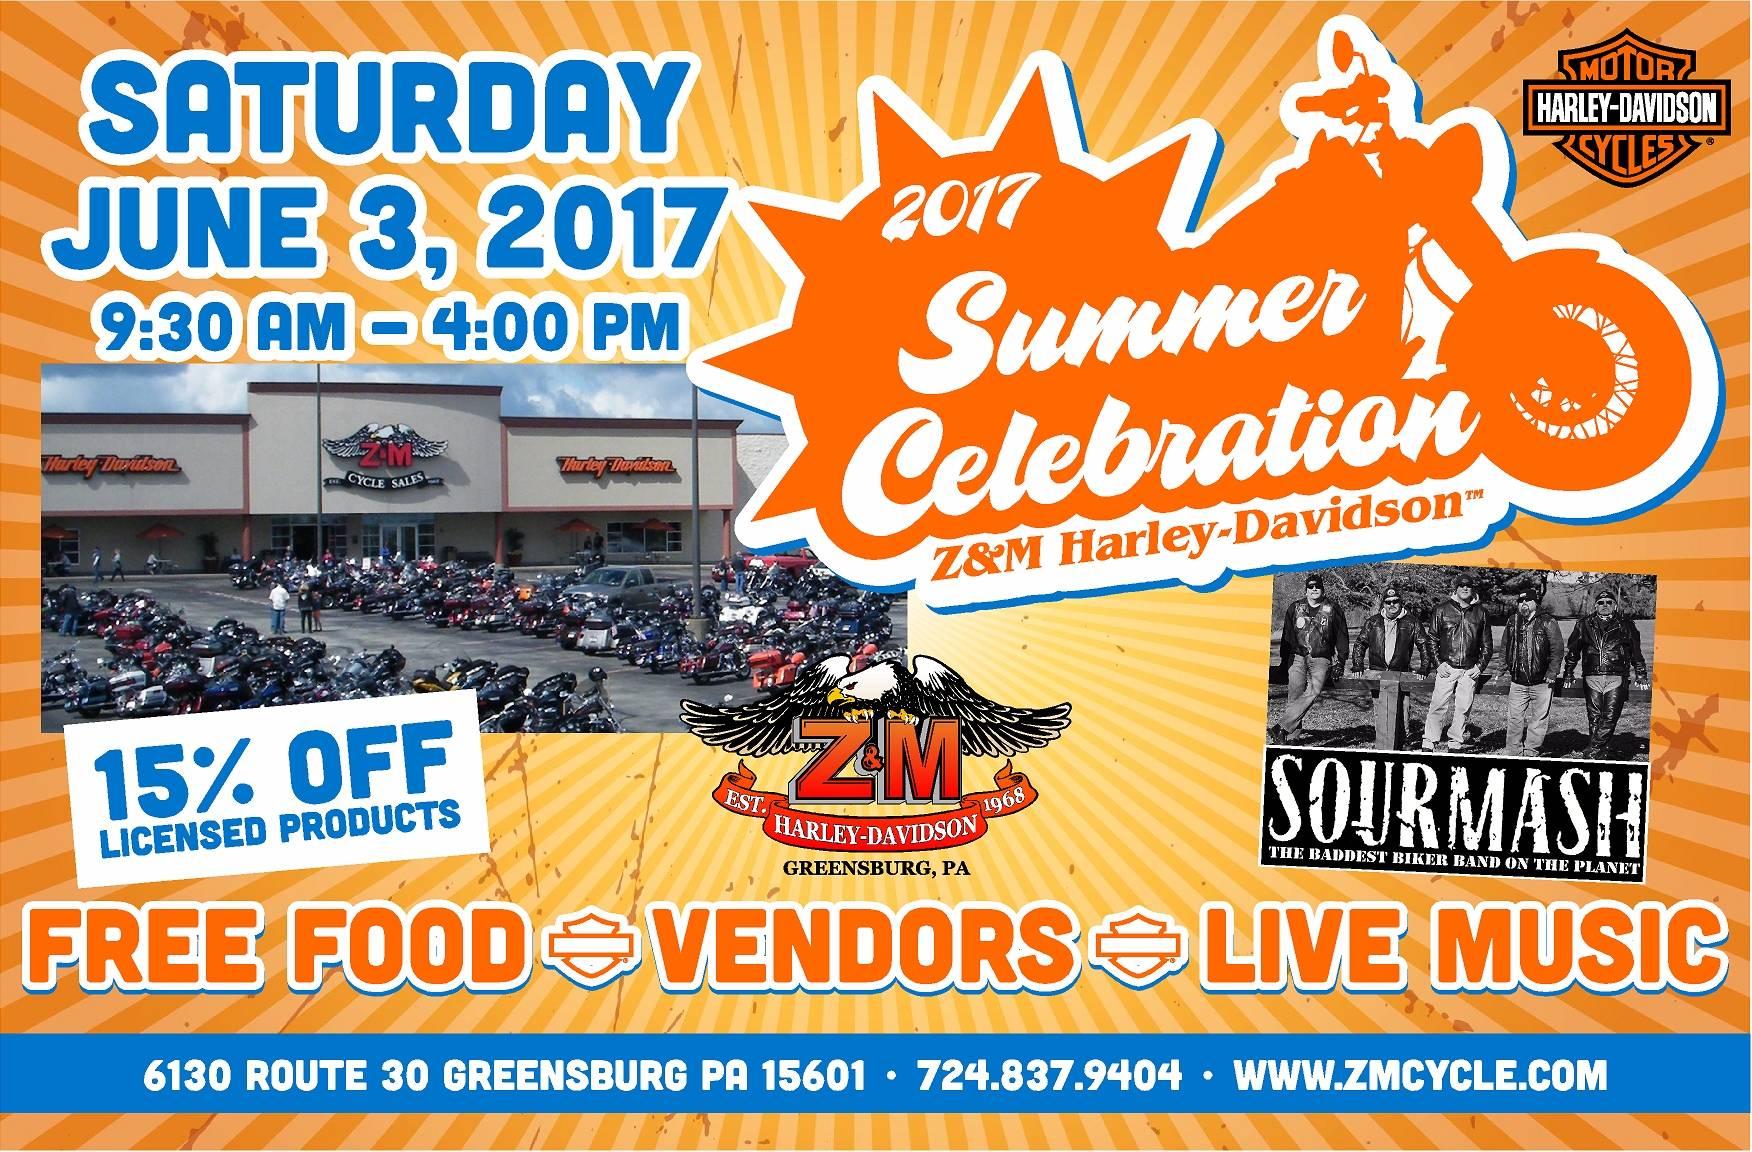 2017 Z&M Summer Celebration